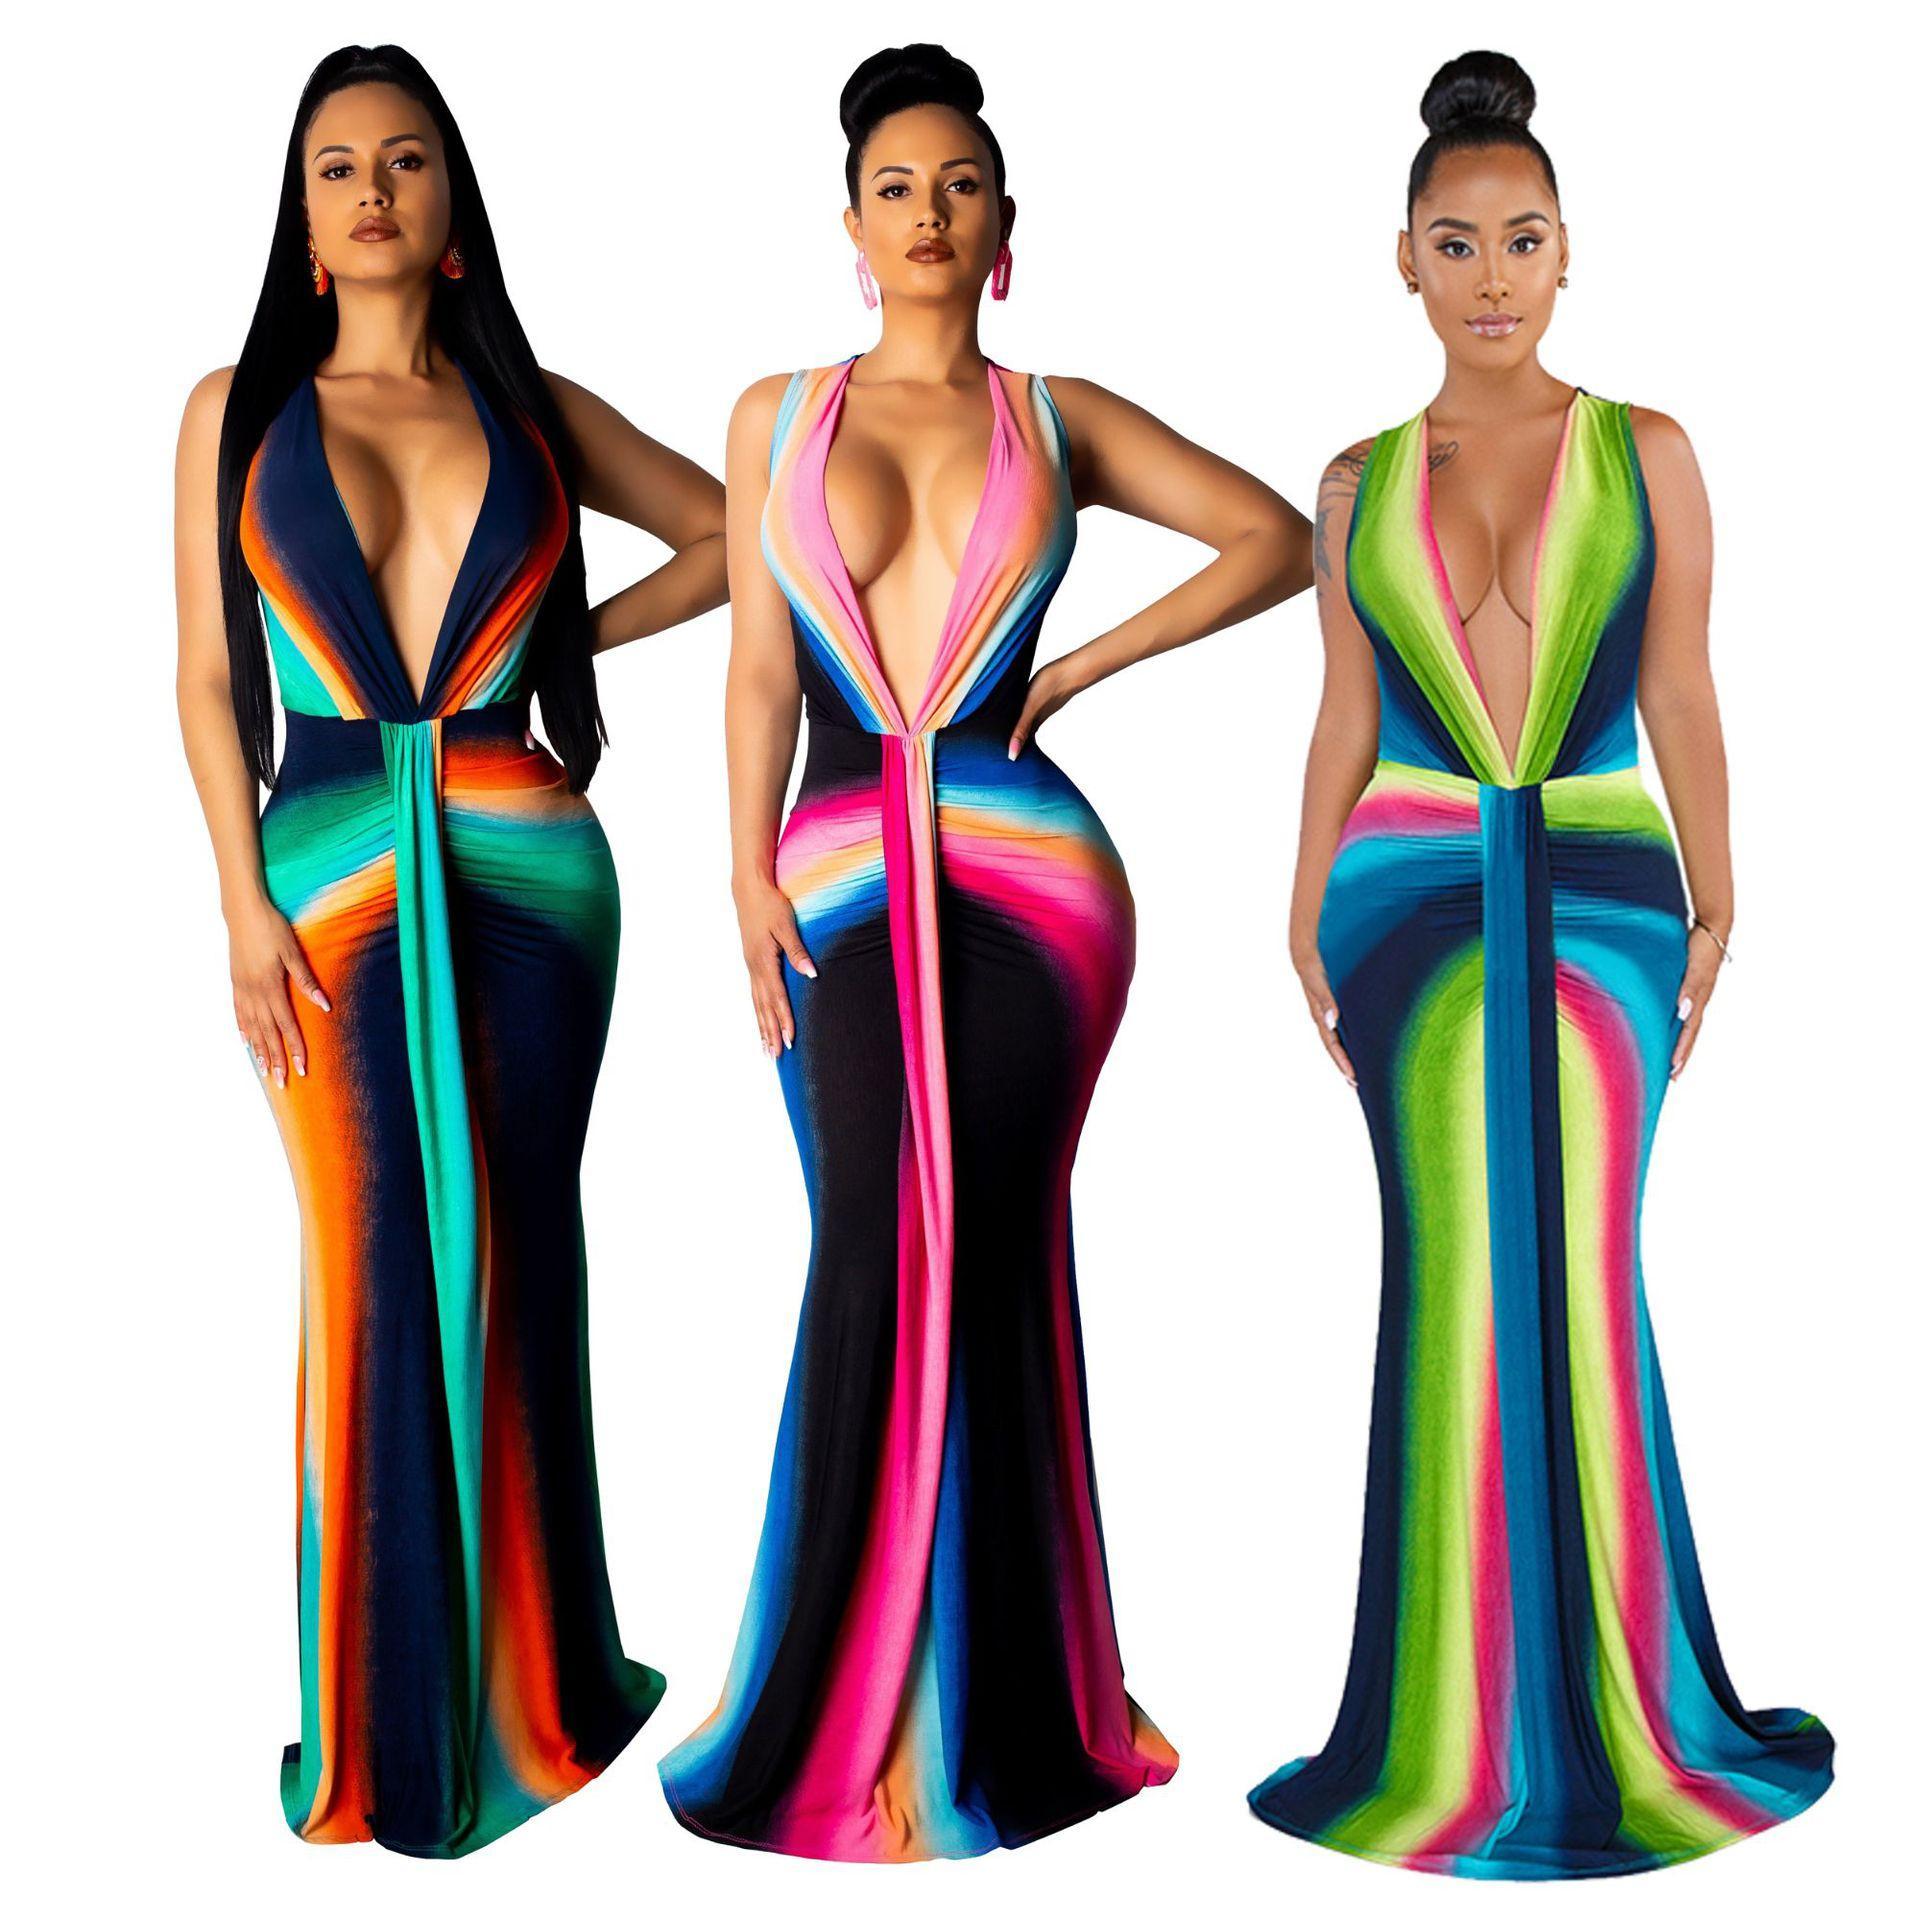 Designer Femmes Patchwork à rayures Robes Casual manches col en V profond Femmes Mode Robes Robe taille naturelle